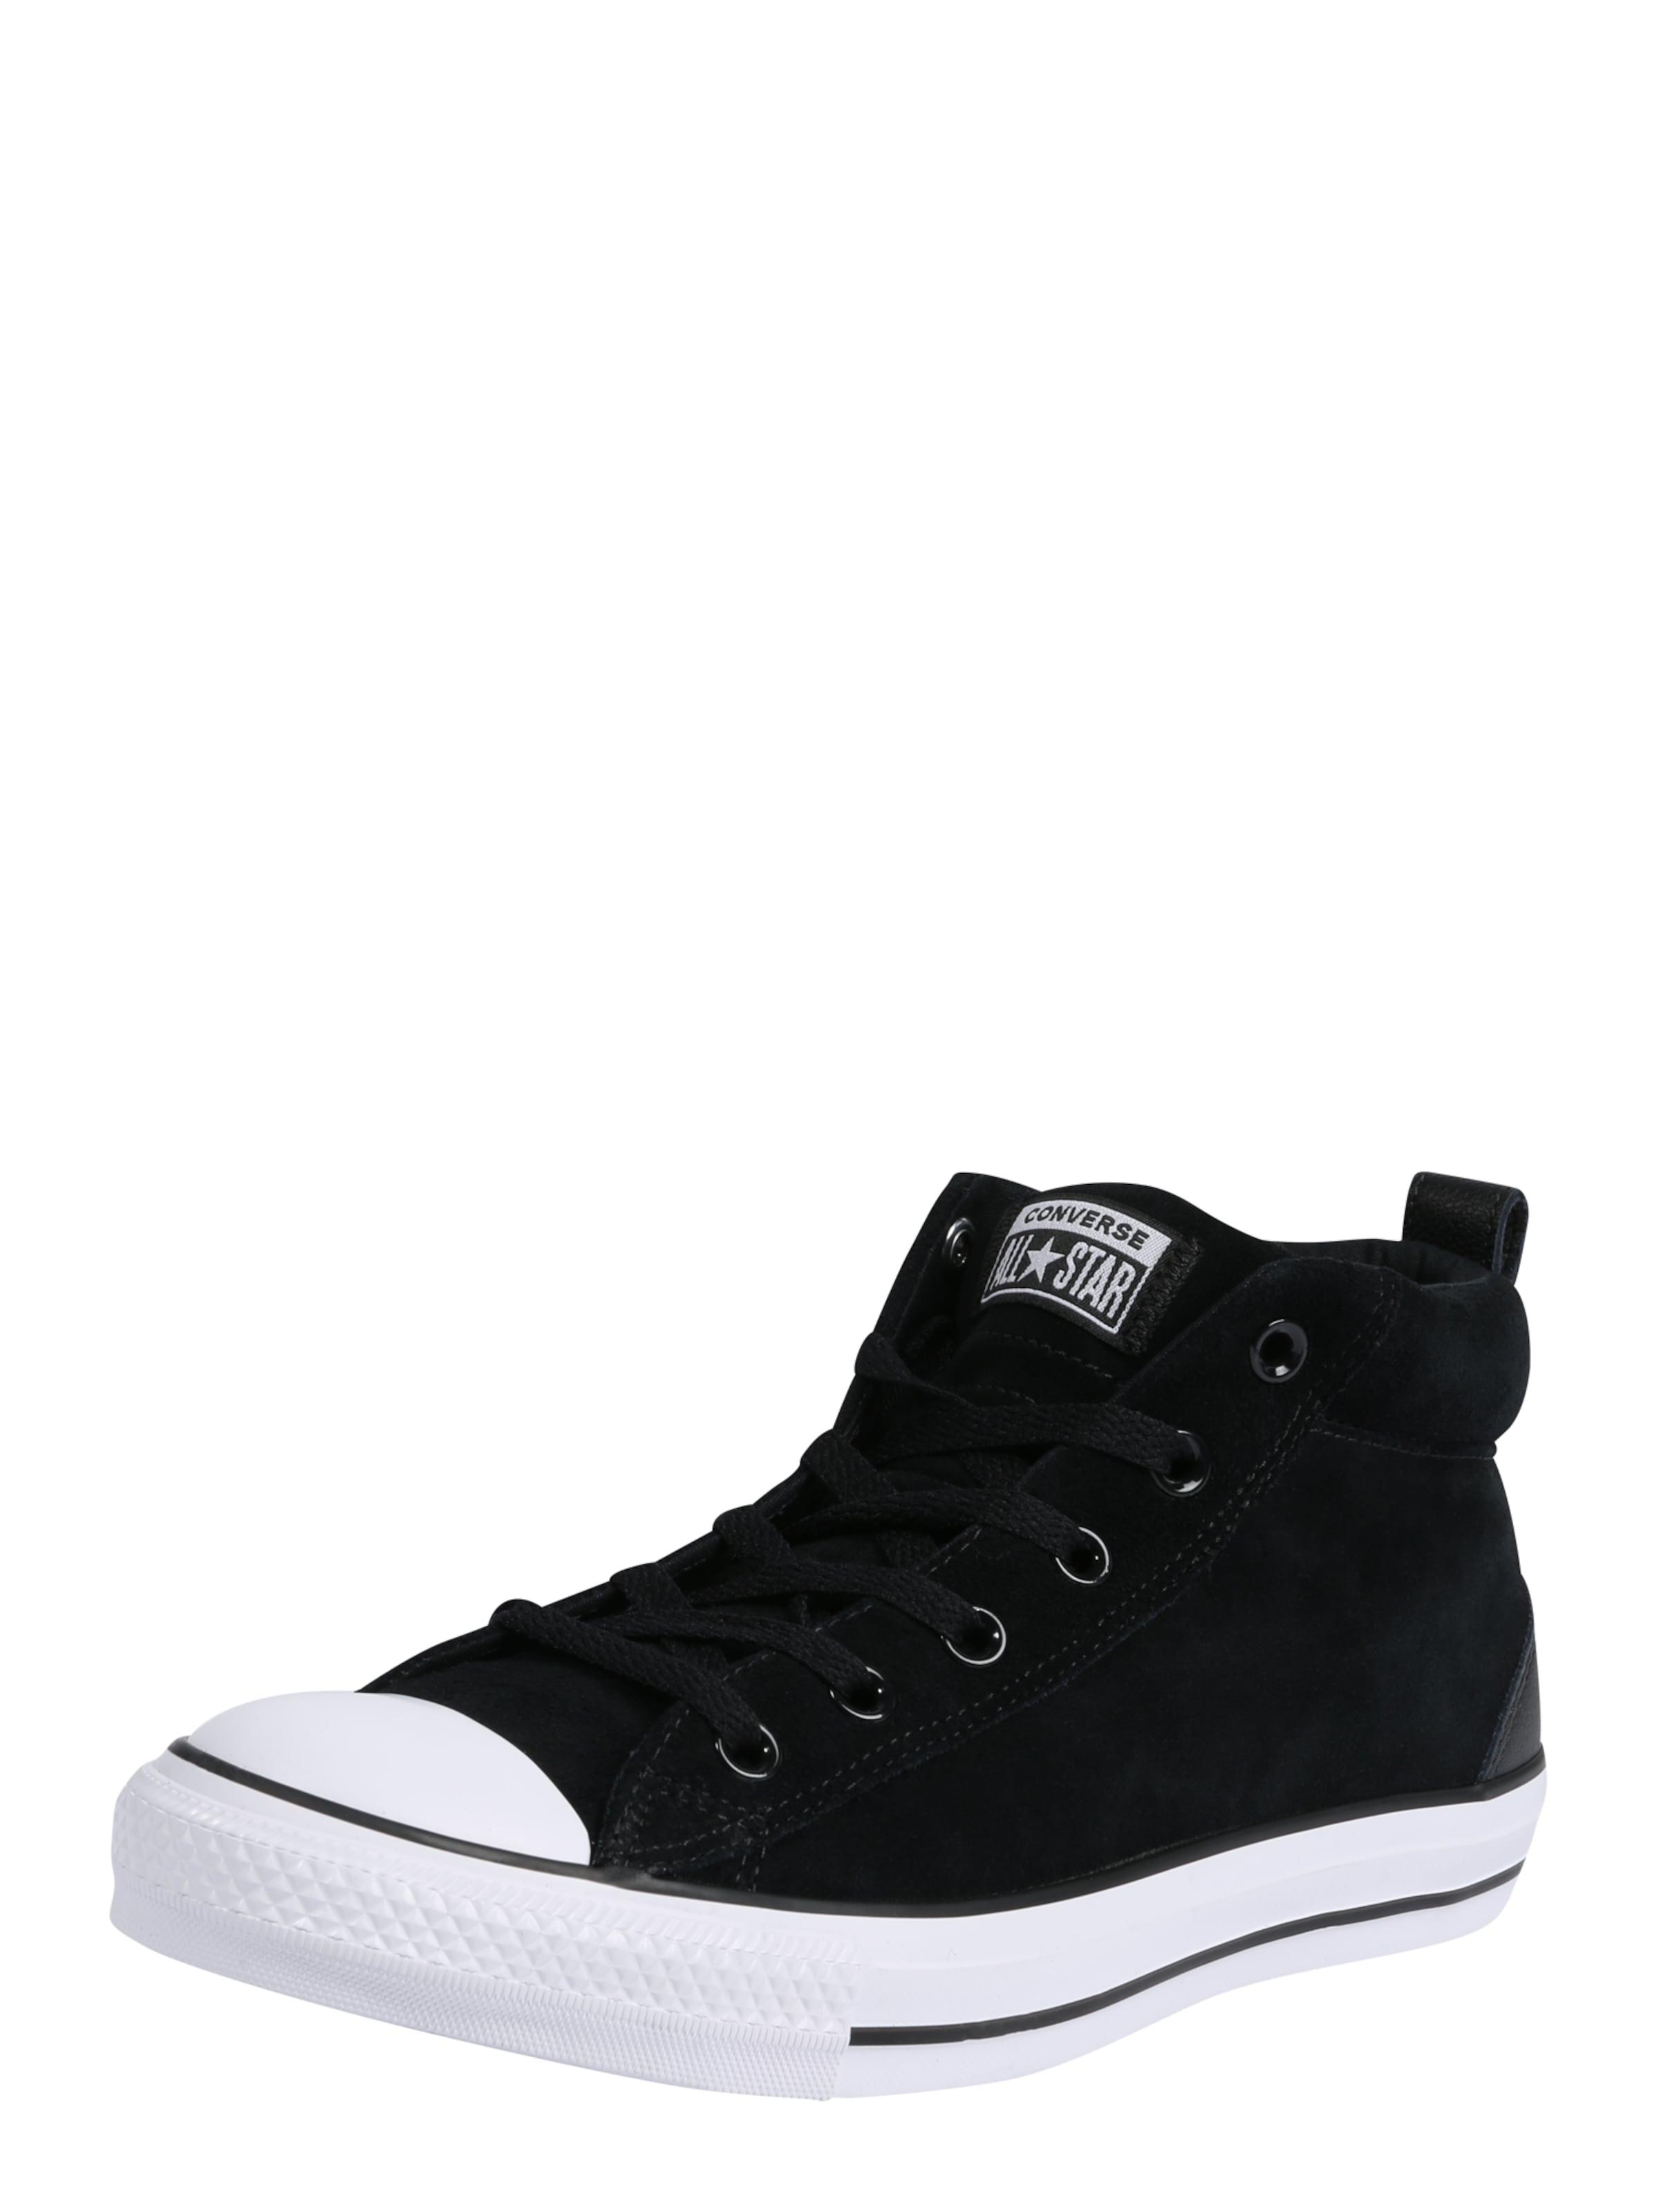 In 'chuck Street' Star SchwarzWeiß Converse All Sneaker Taylor 5j3AqS4LcR